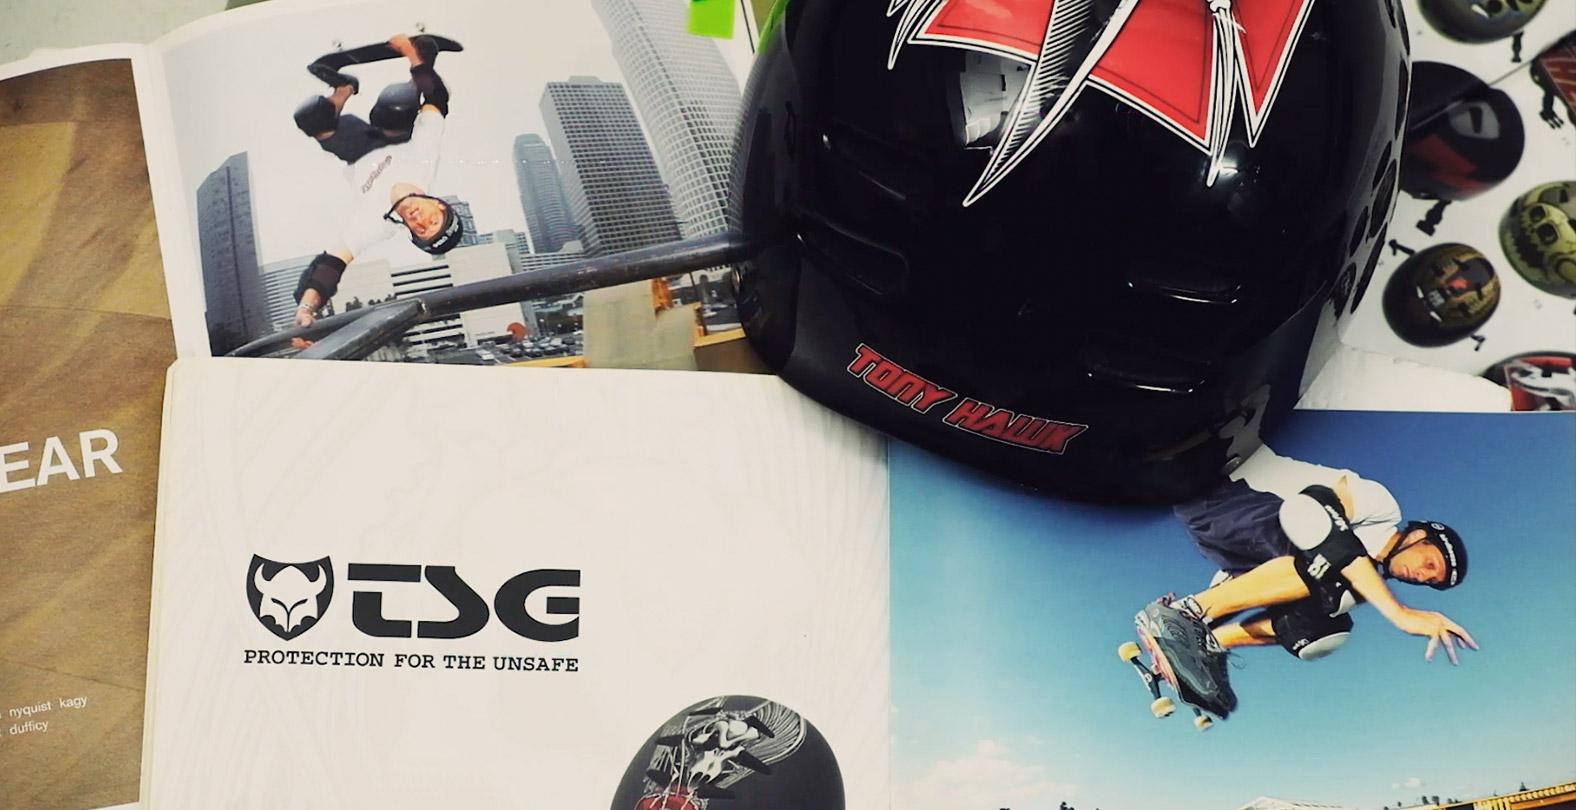 TSG posters Tony Hawk